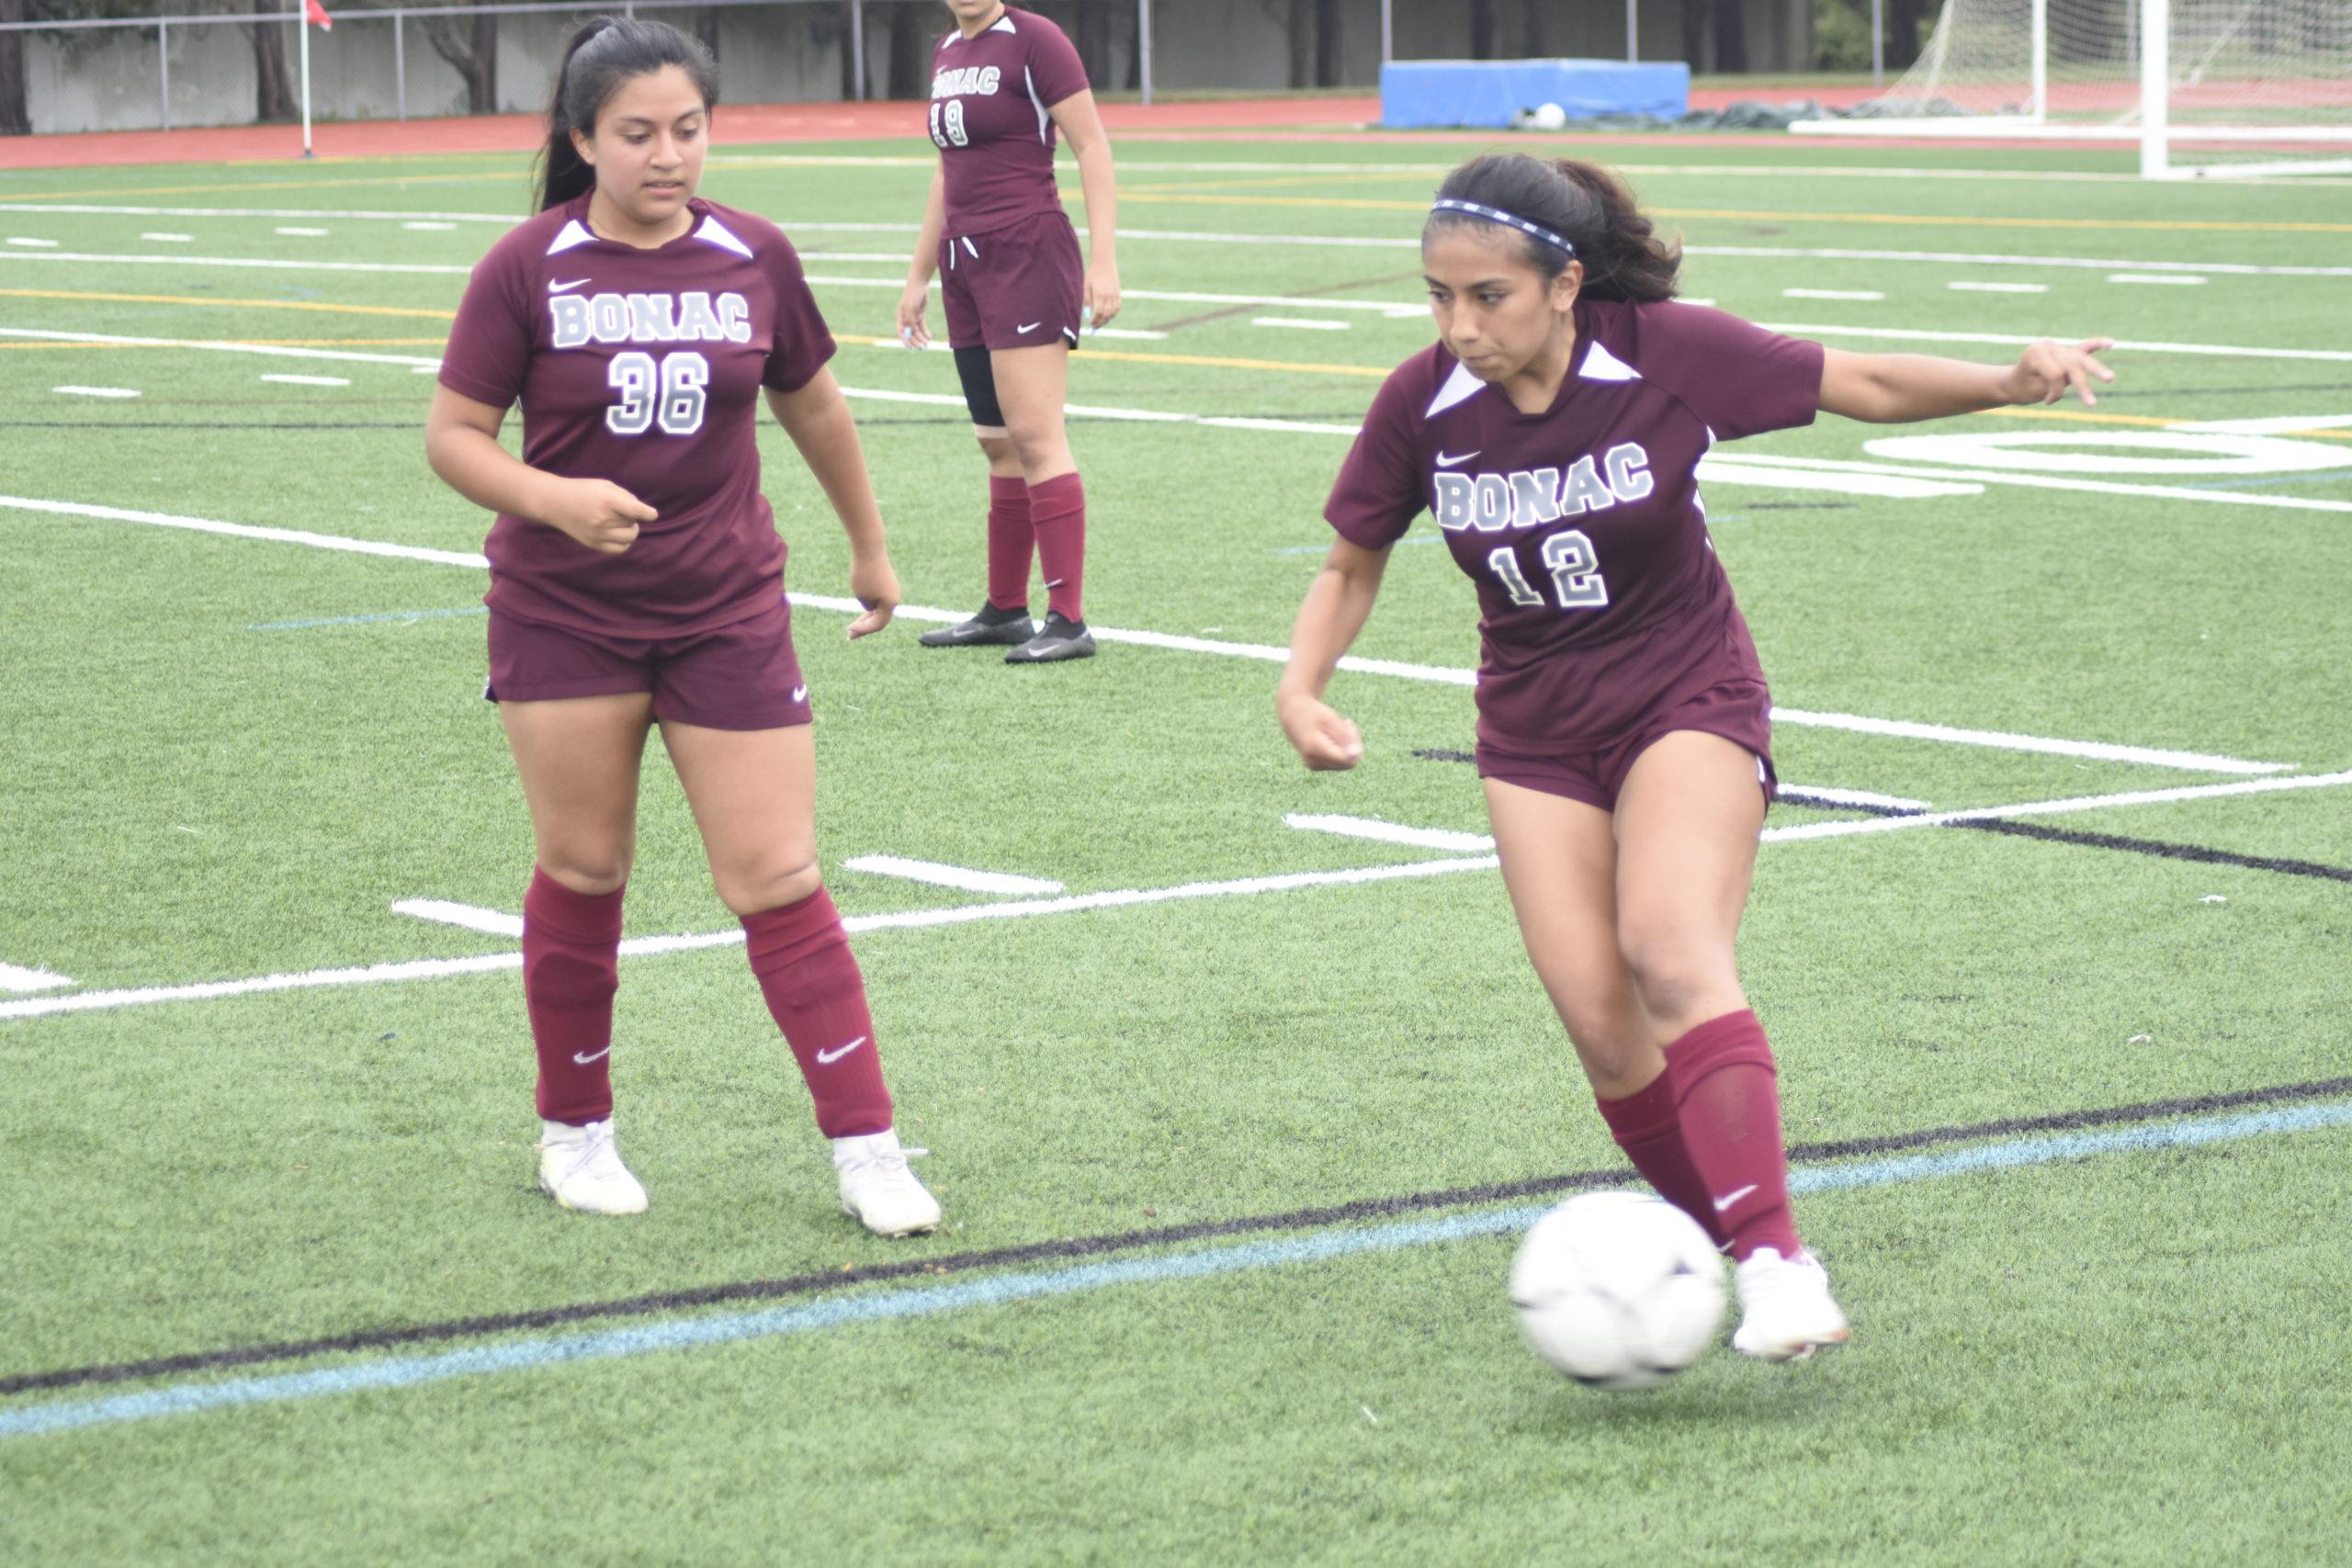 With junior Tiffany Pesantez looking on, junior Bonacker Nicole Velez plays the ball near the sideline.